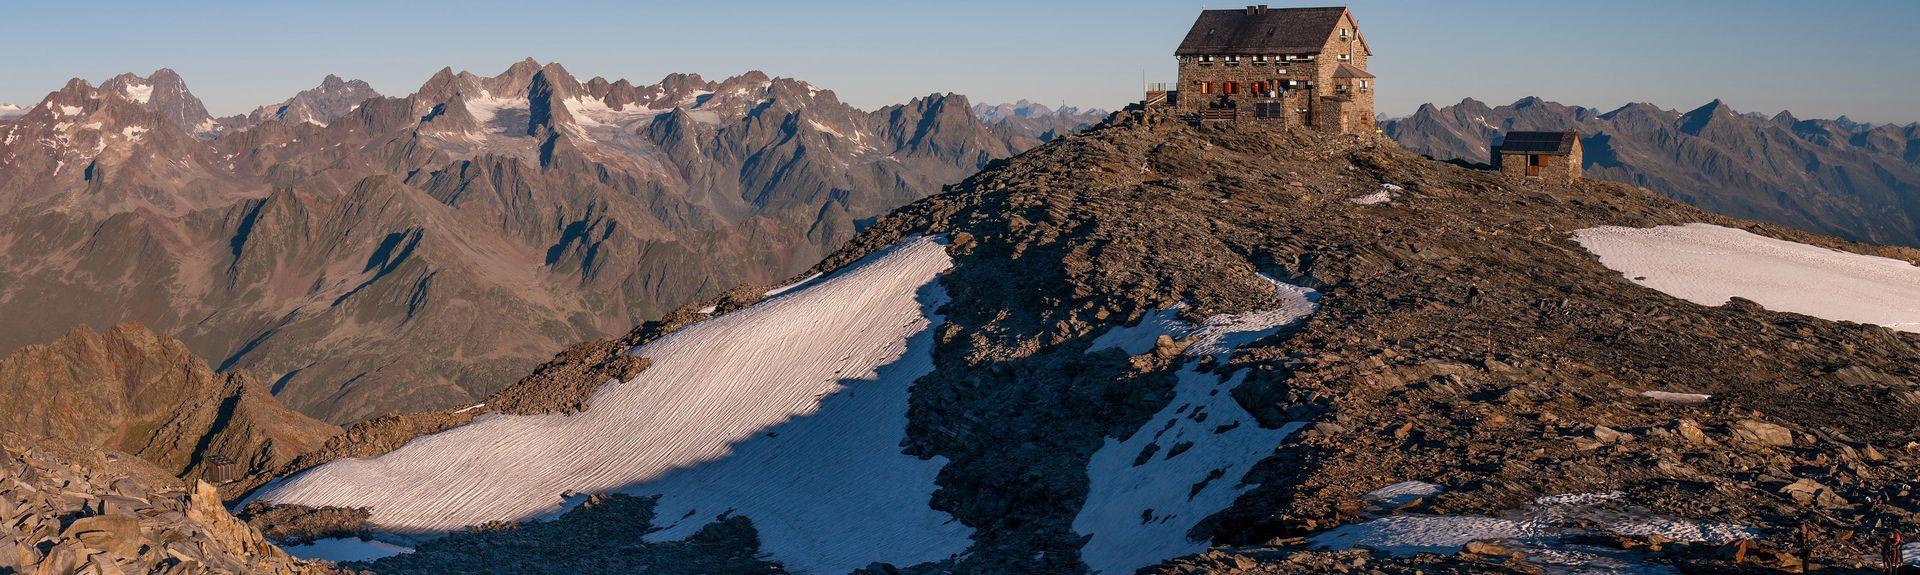 Sölden, Tirol, Áustria